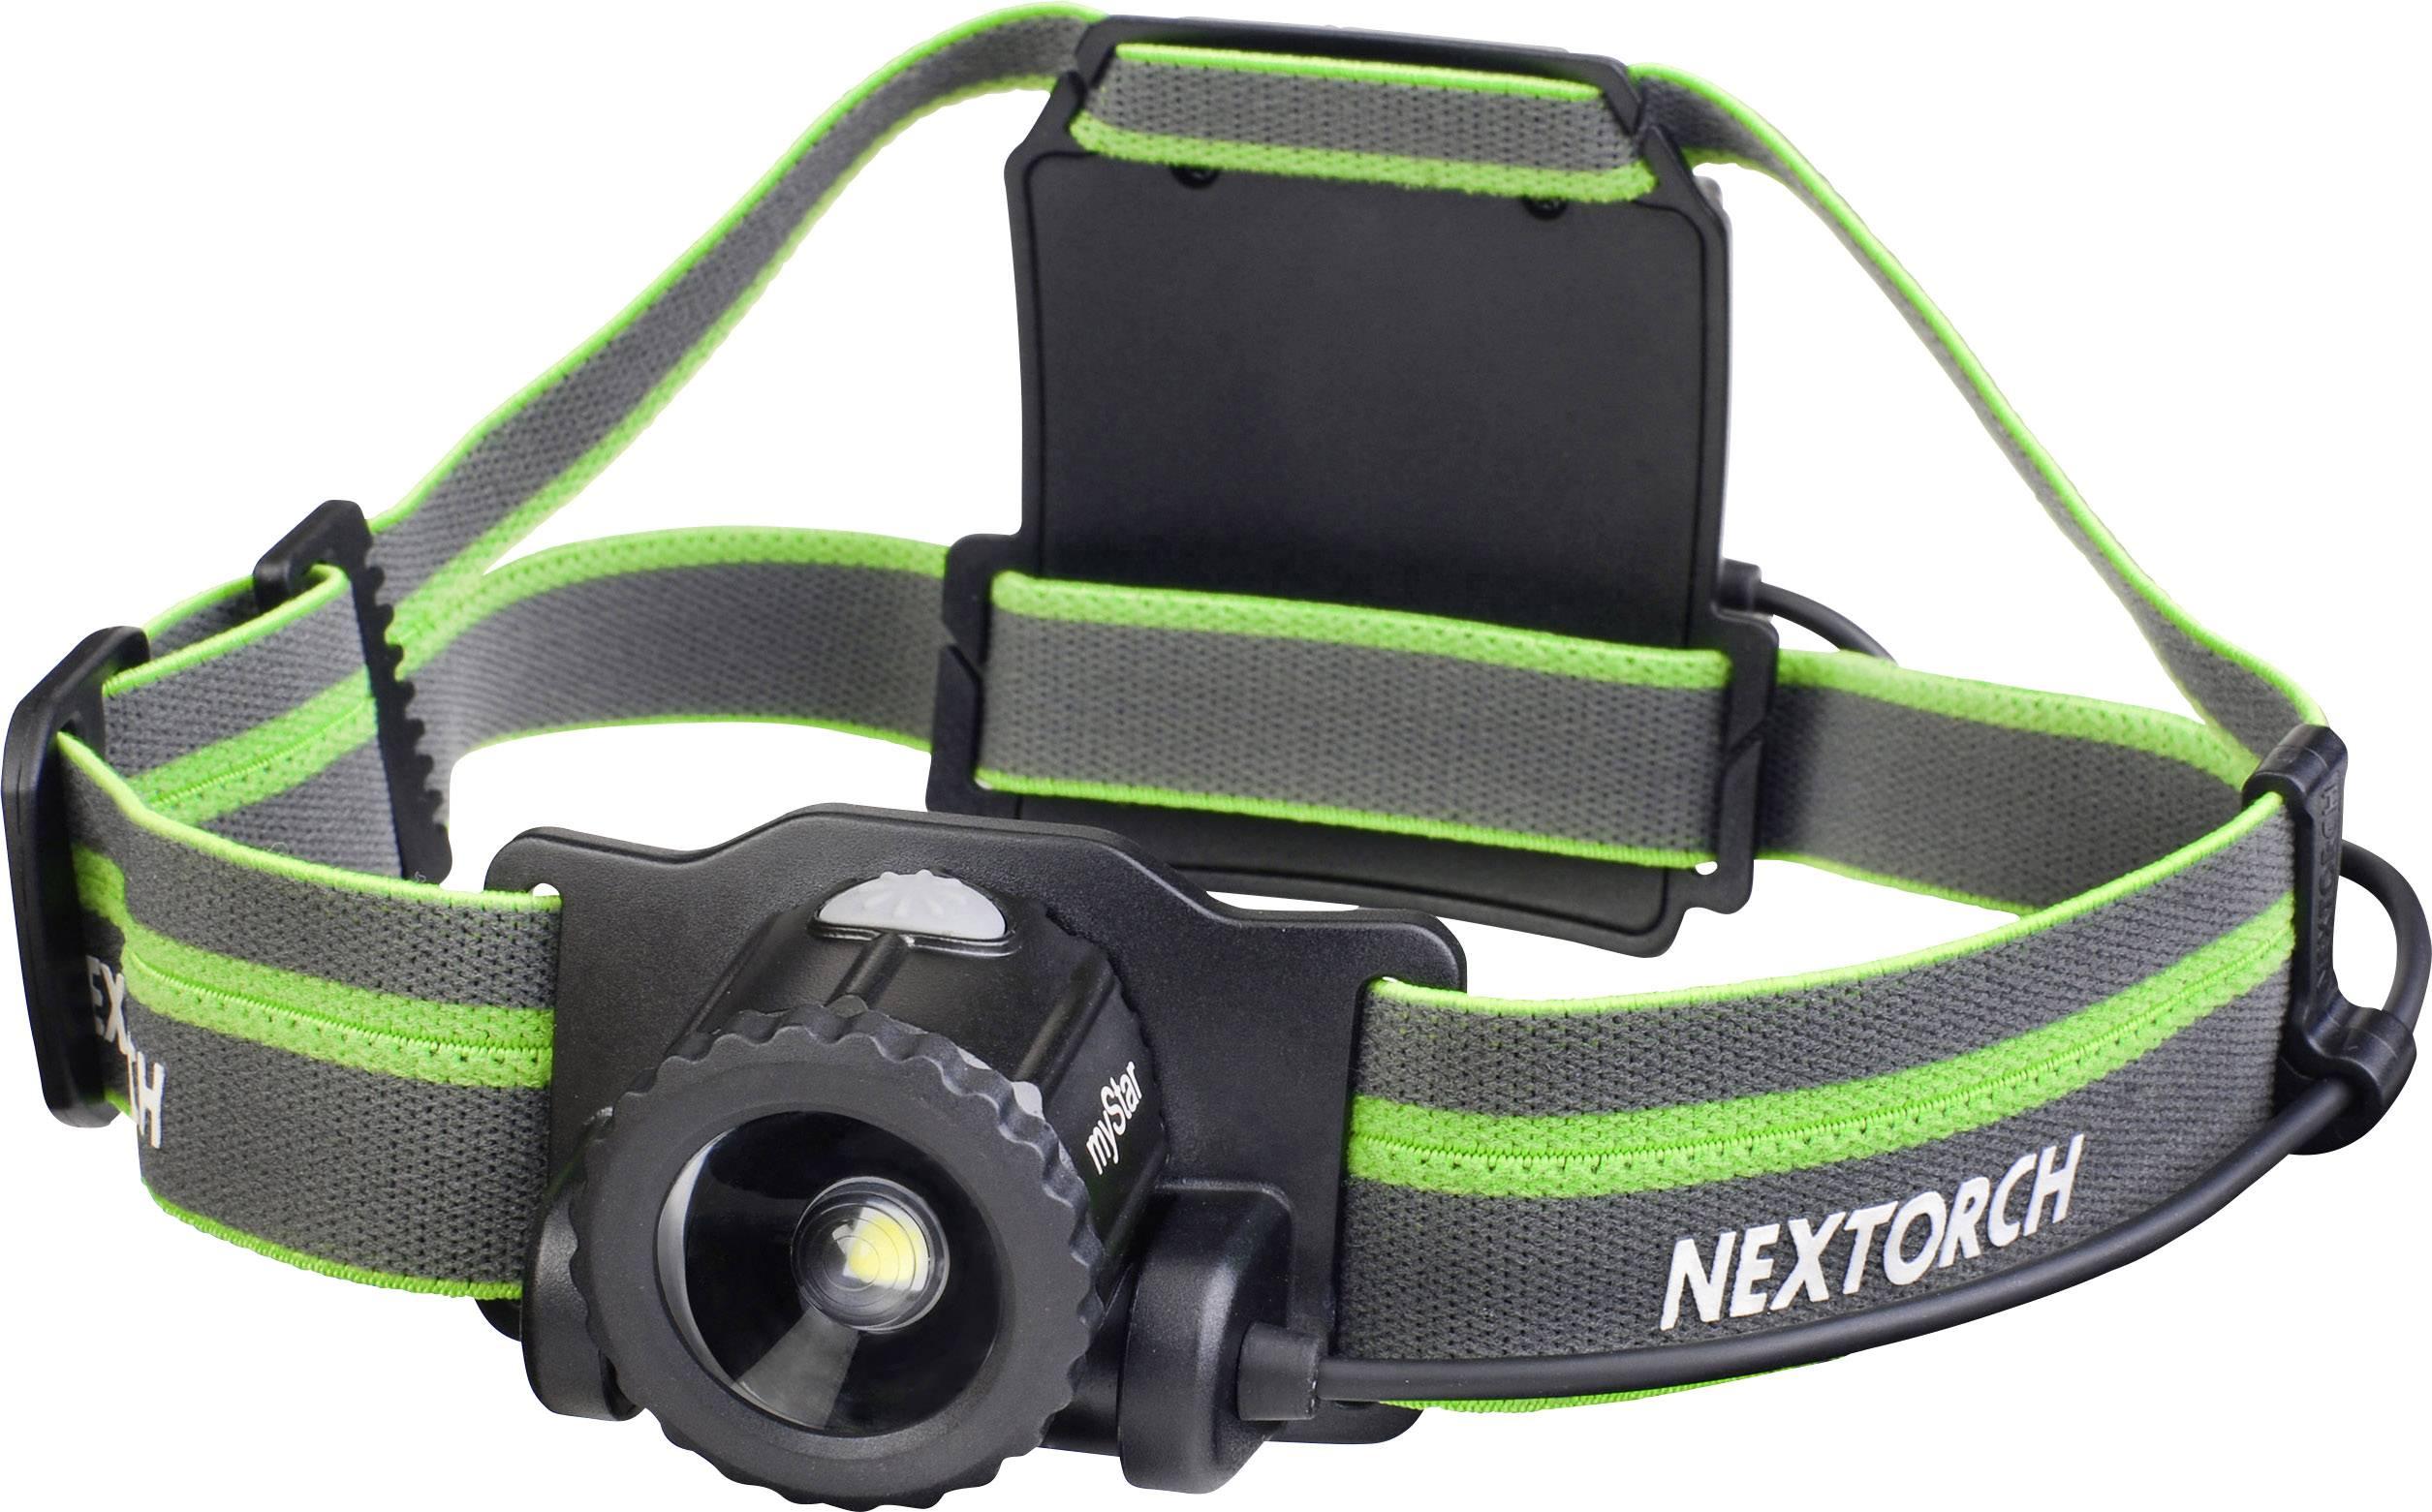 Nextorch myStar-gruen LED Lamp